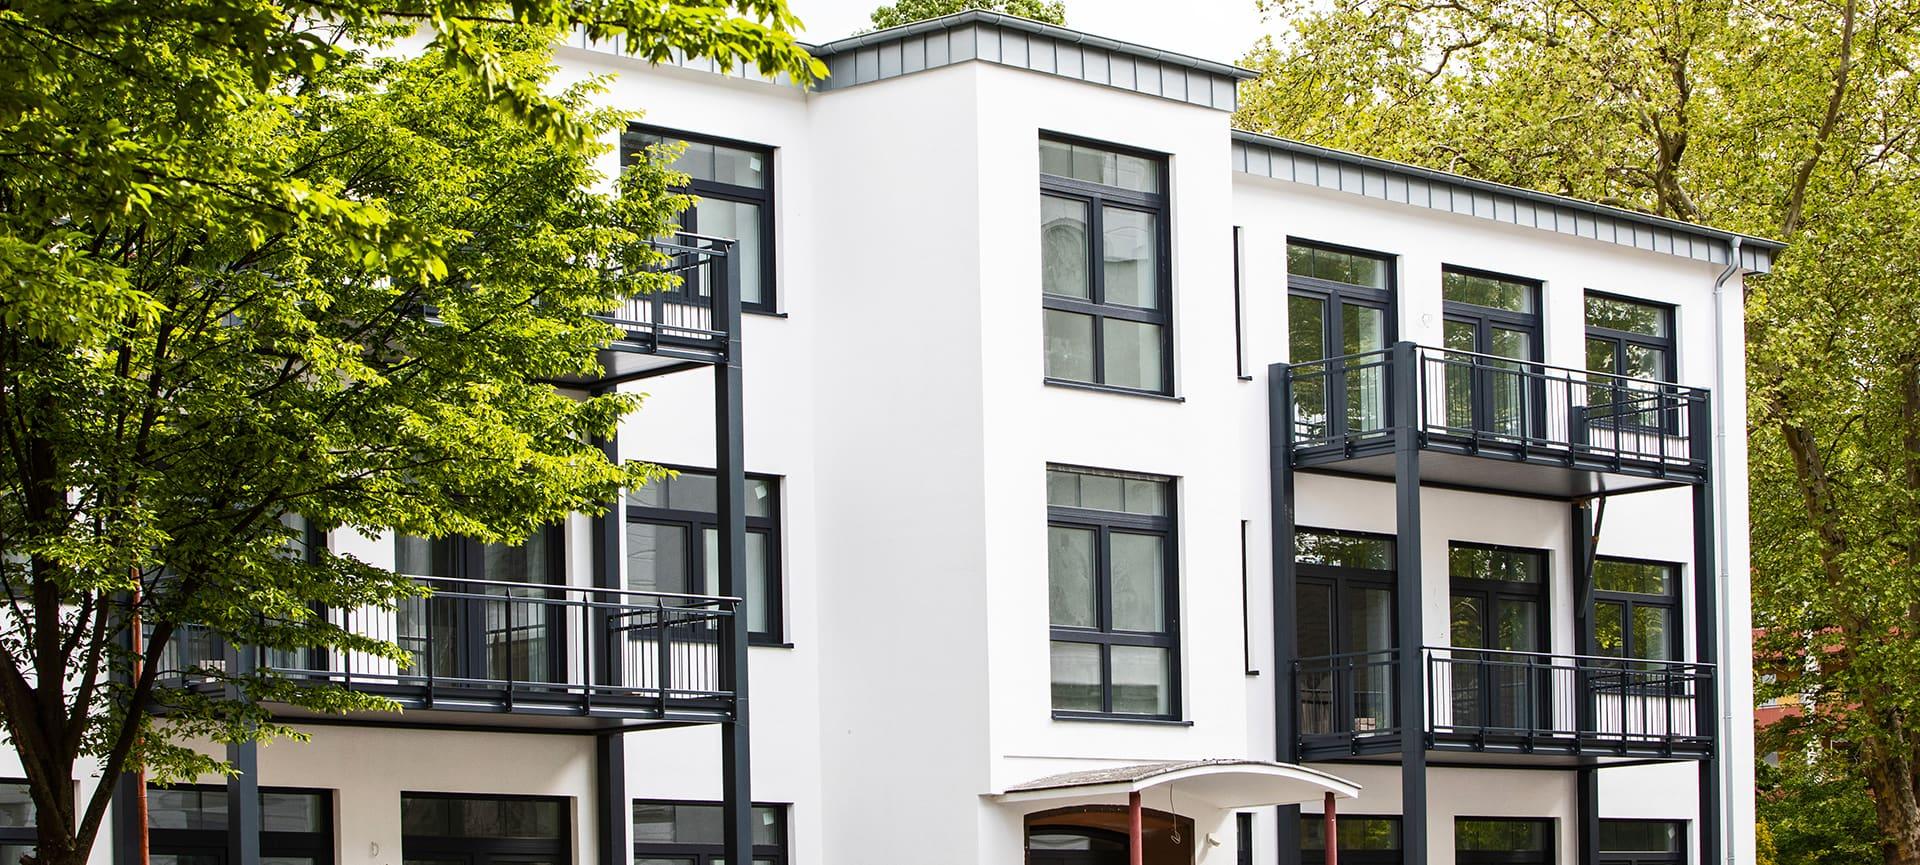 modernes weisses wohngebaeude mit schwarzen balkonen